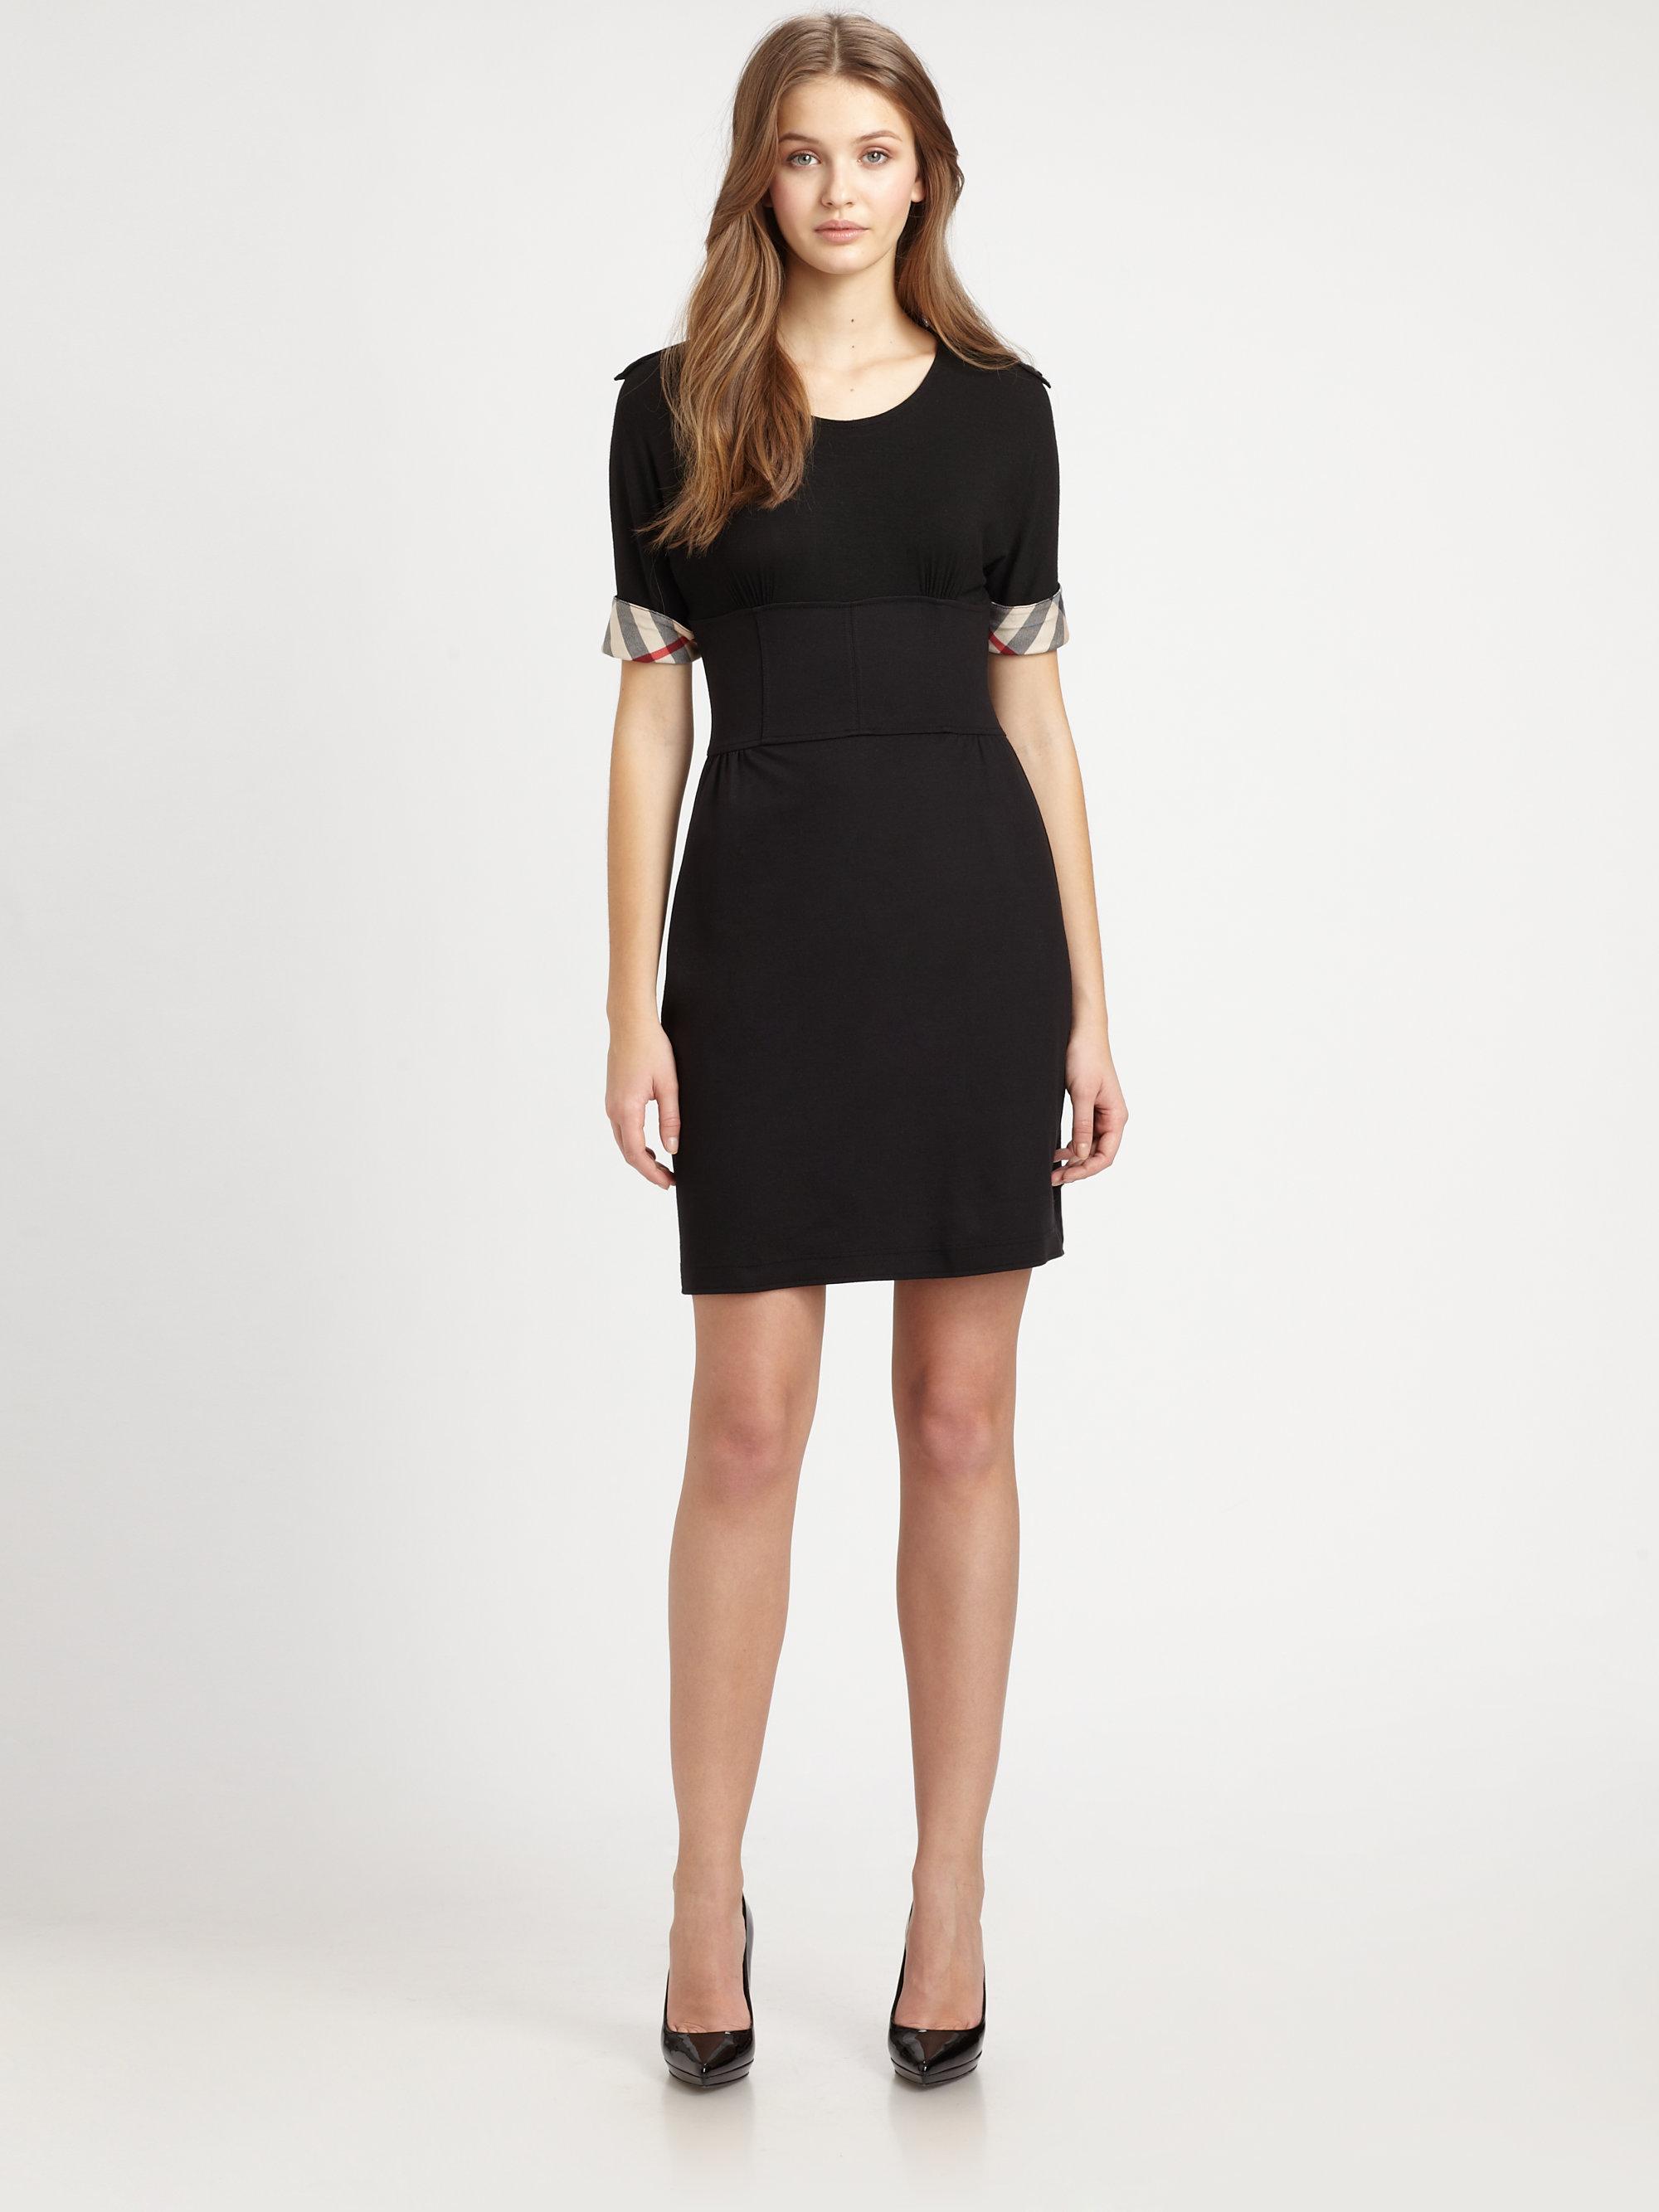 Burberry Brit Jersey Check Trim Dress in Black | Lyst